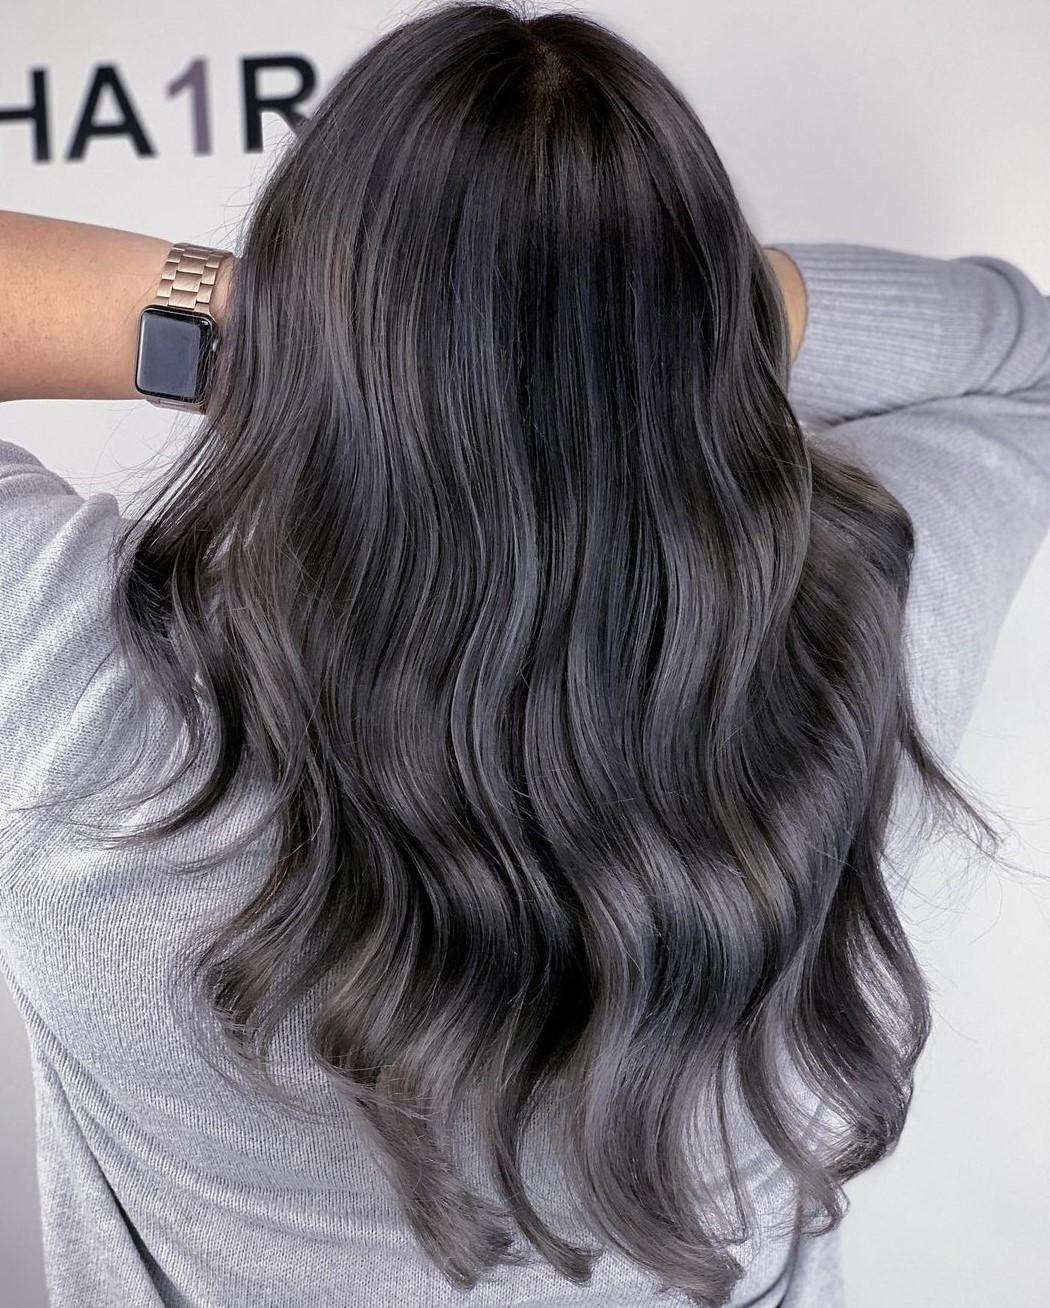 Subtle Gray Highlights for Black Hair